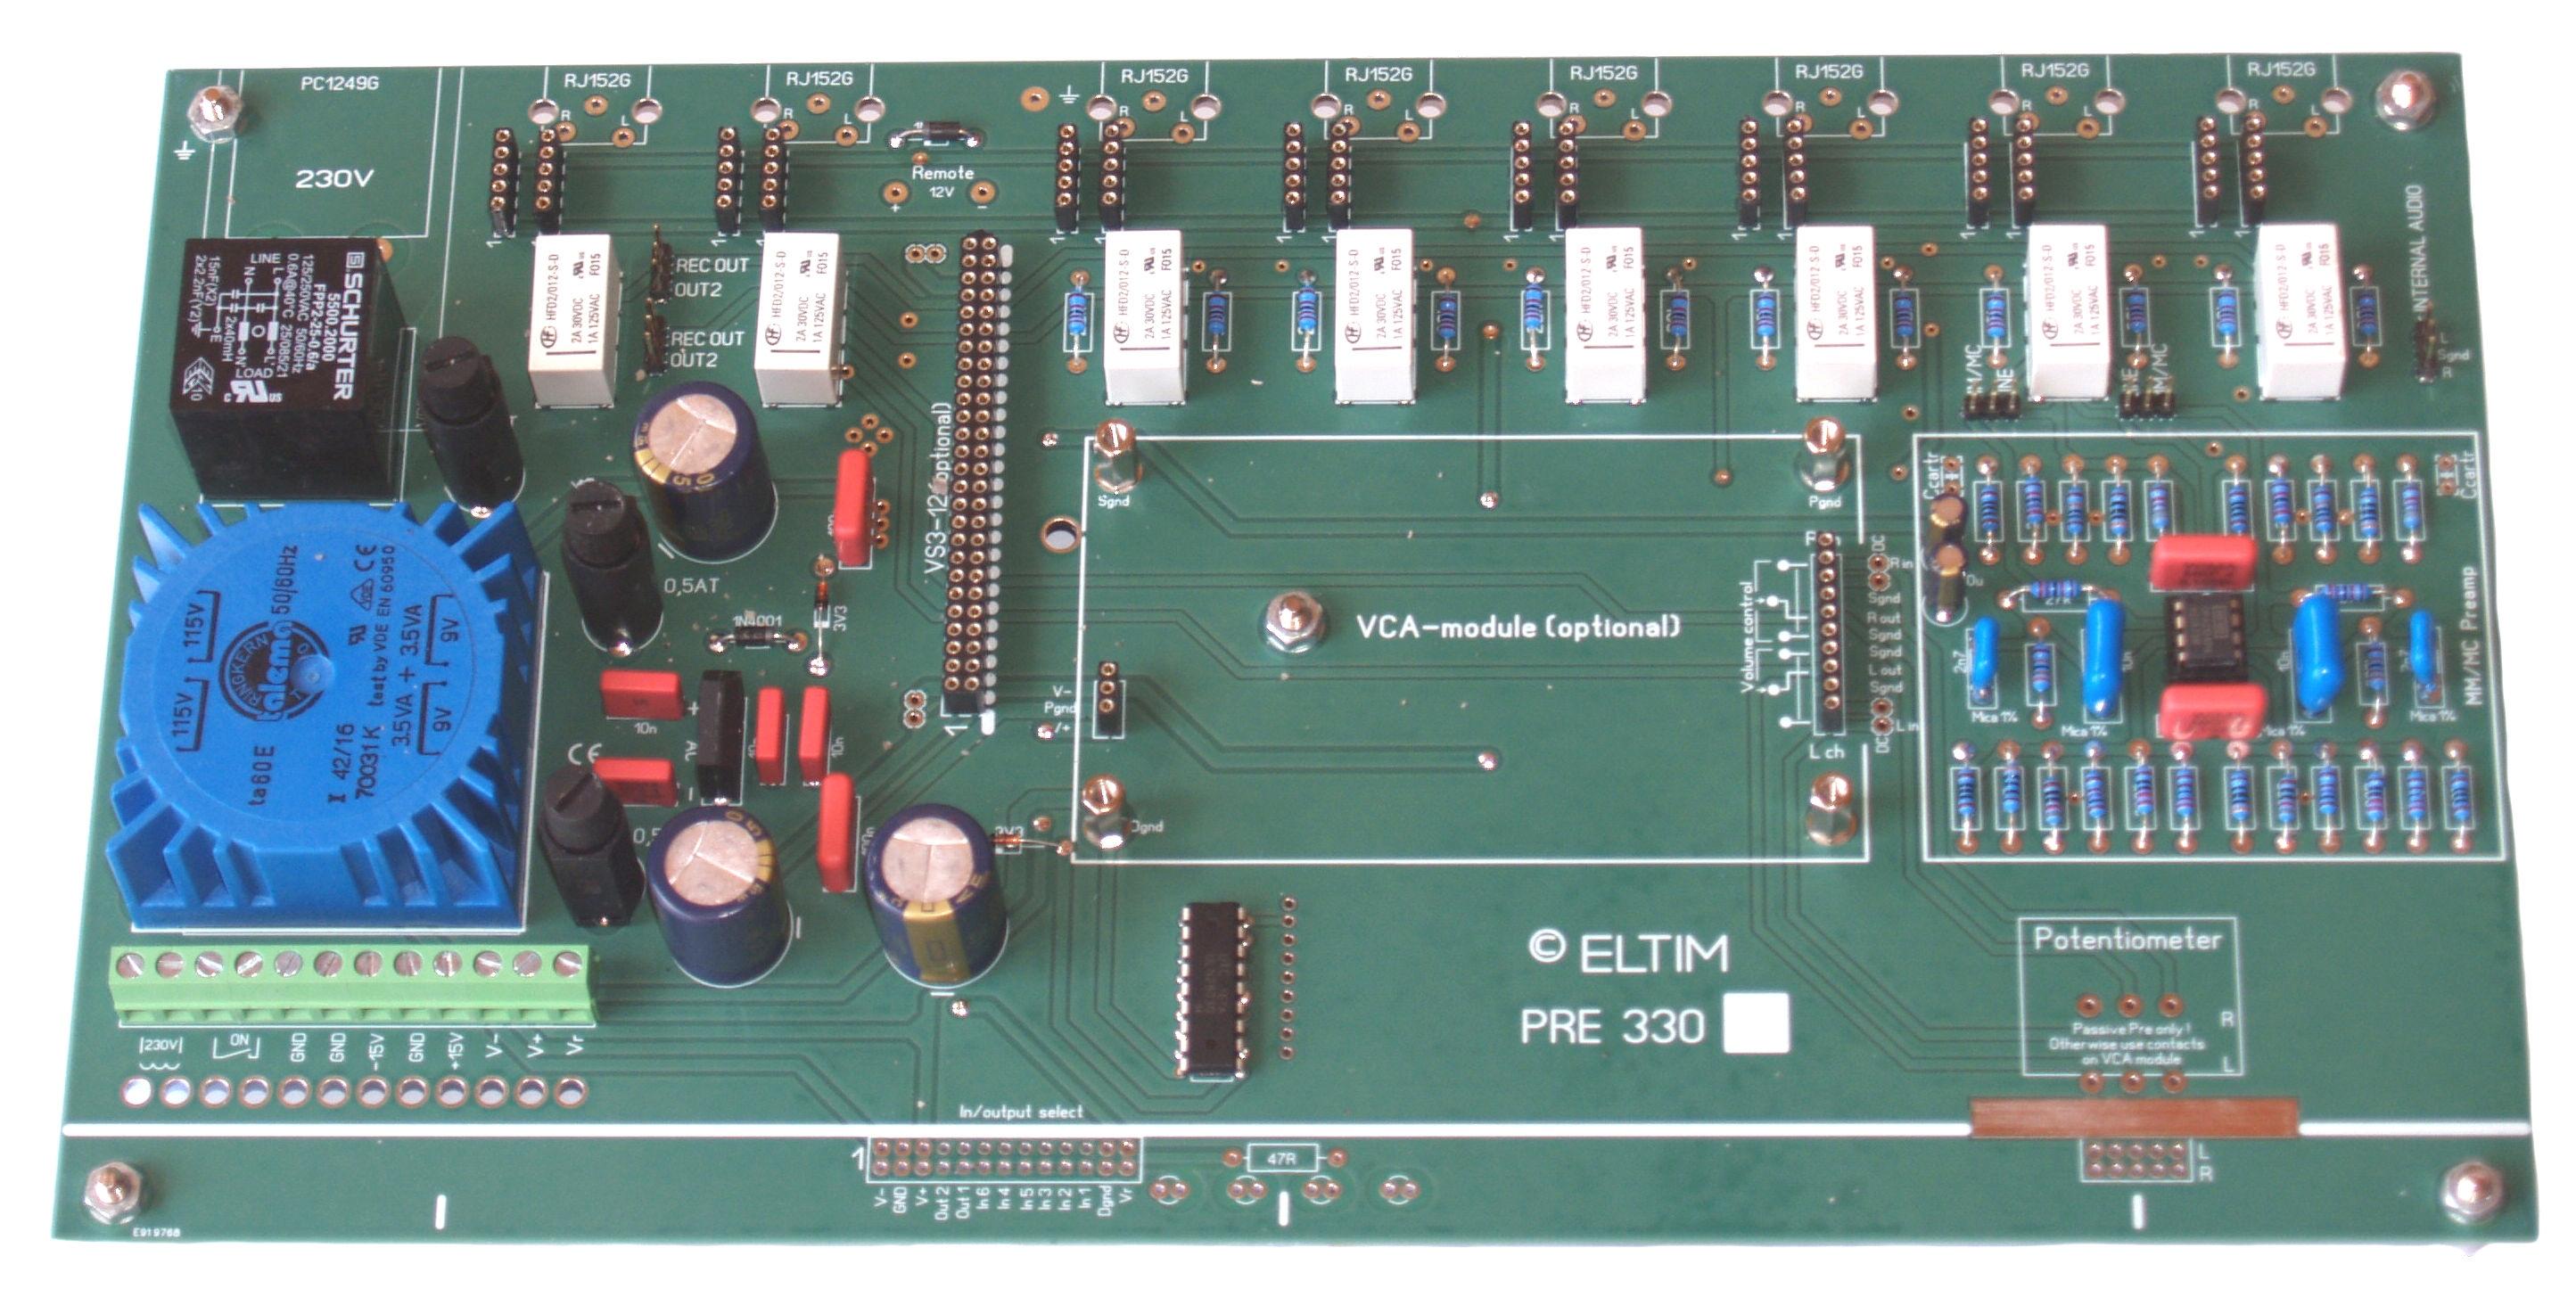 ELTIM Preamplifier modules